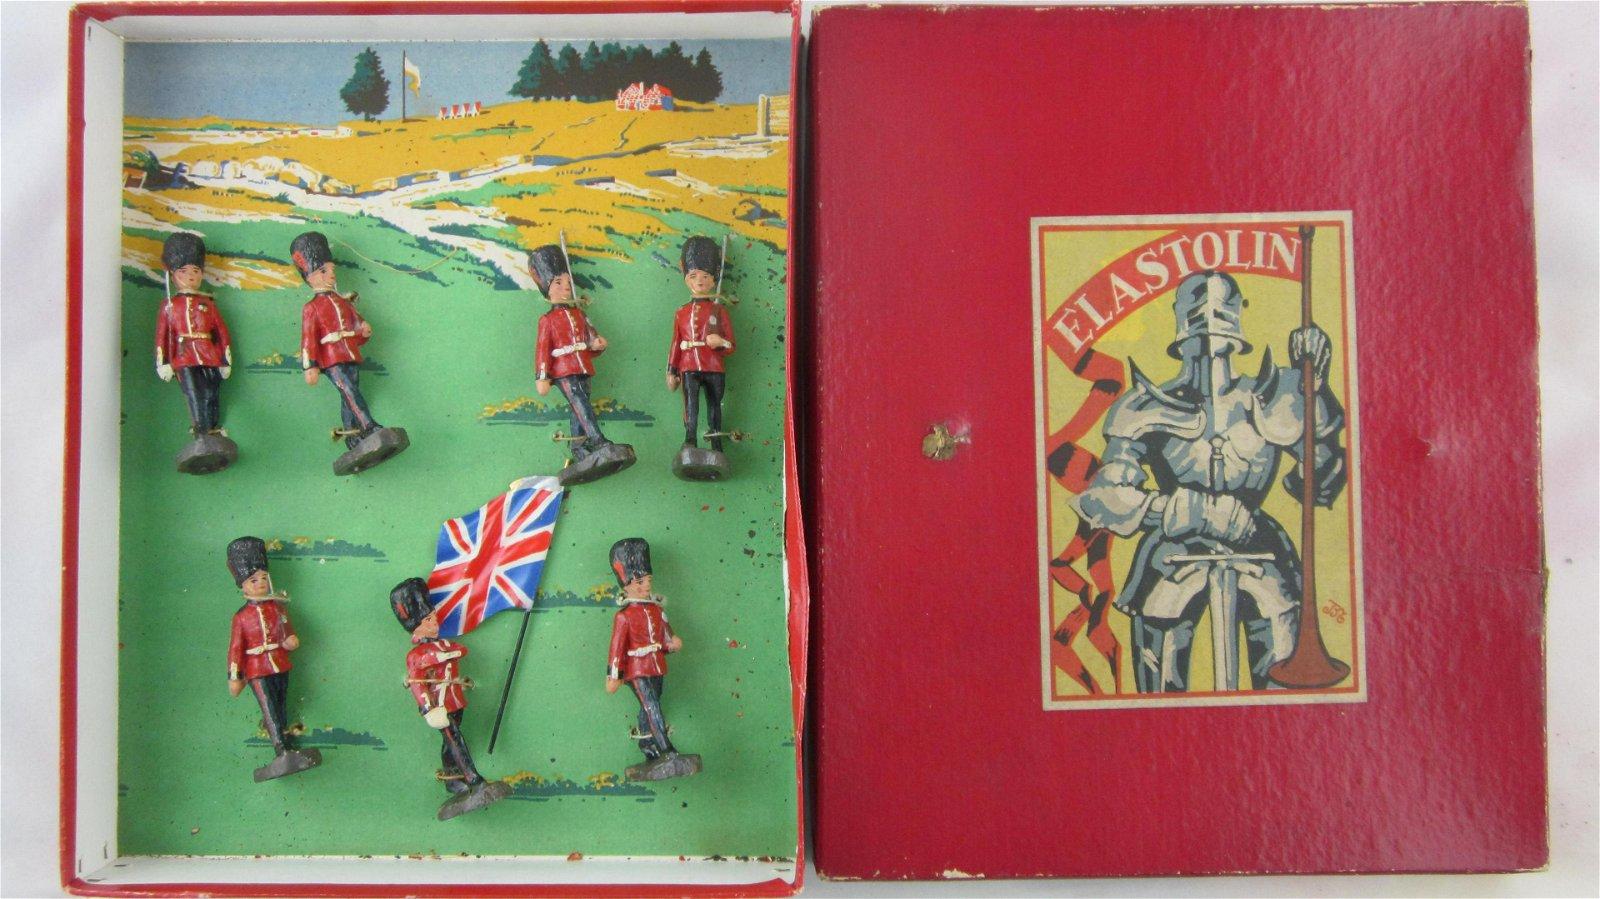 Elastolin Composition English Guards 1904.